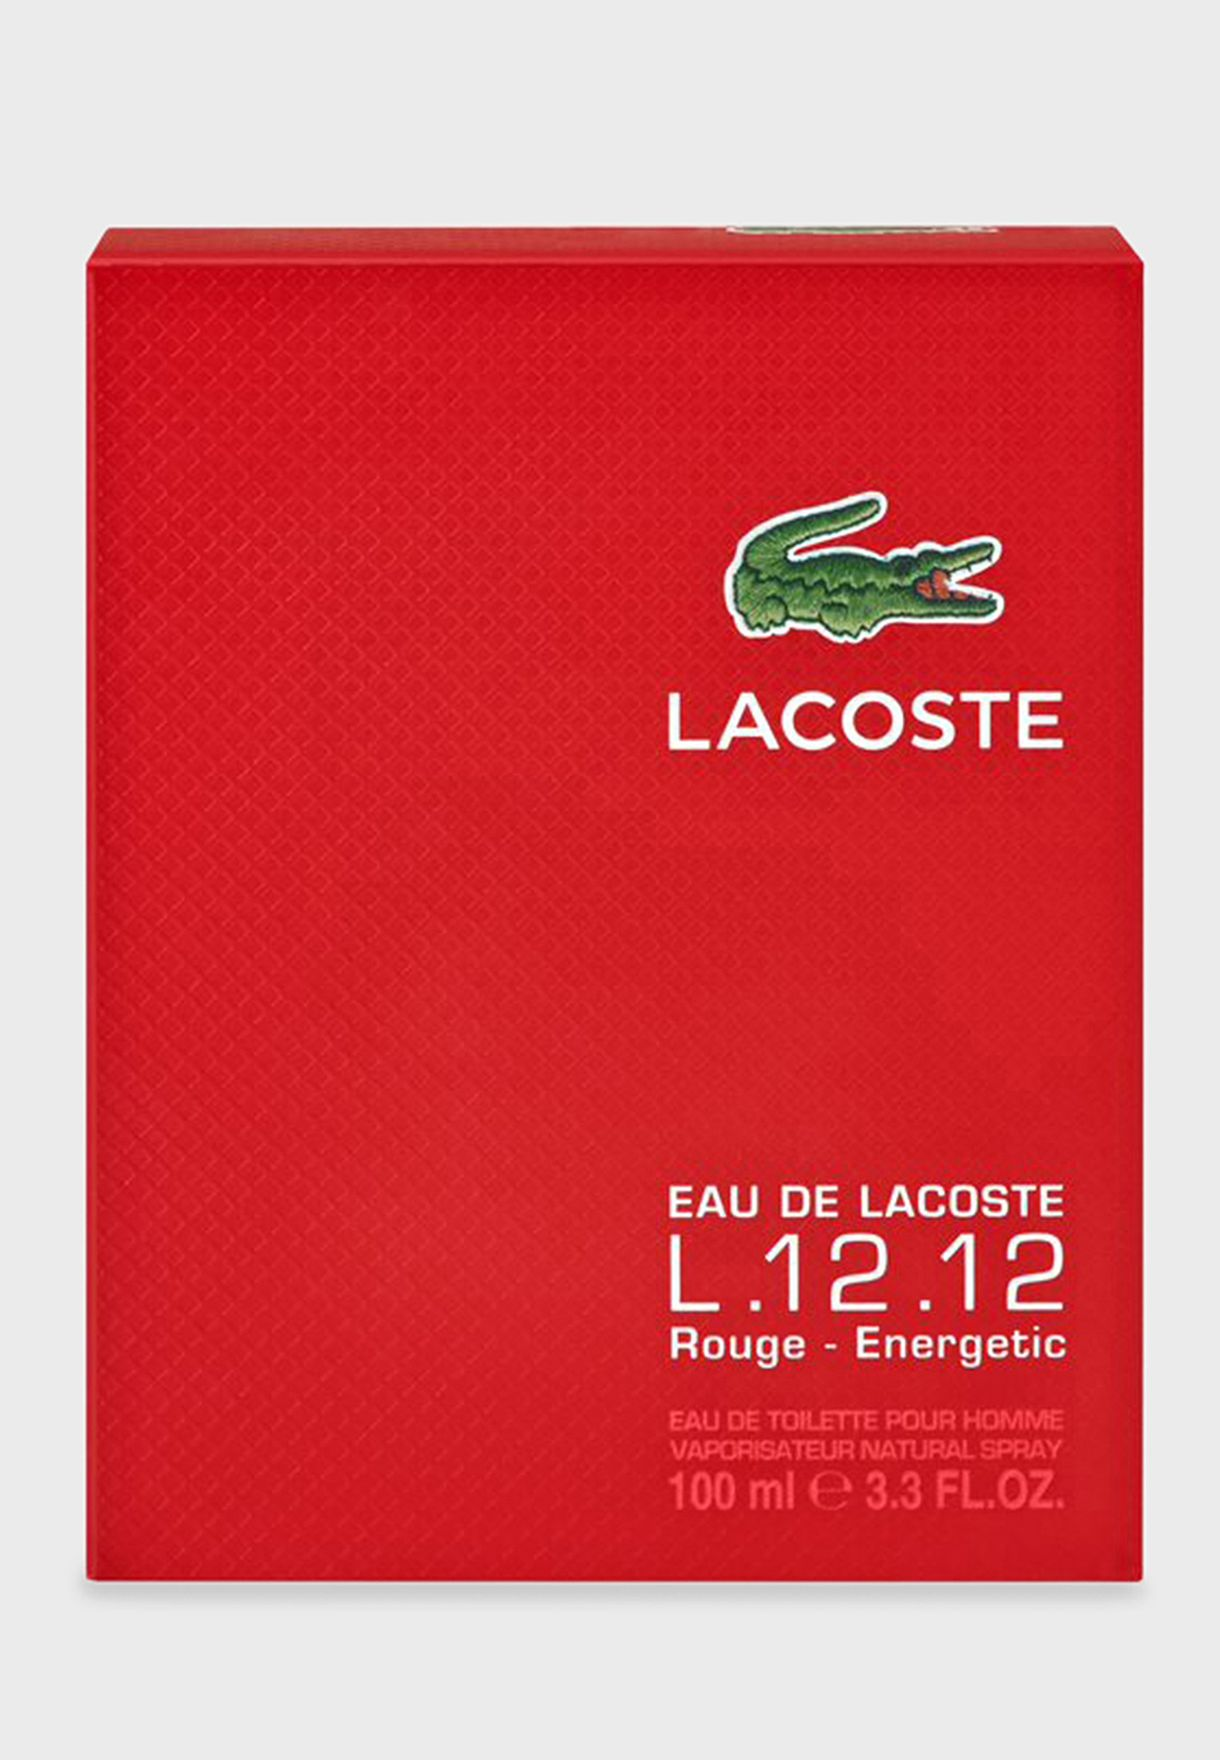 e7babfadc تسوق عطر بور جون - 100 مل او دو تواليت ماركة لاكوست لون شفاف ...